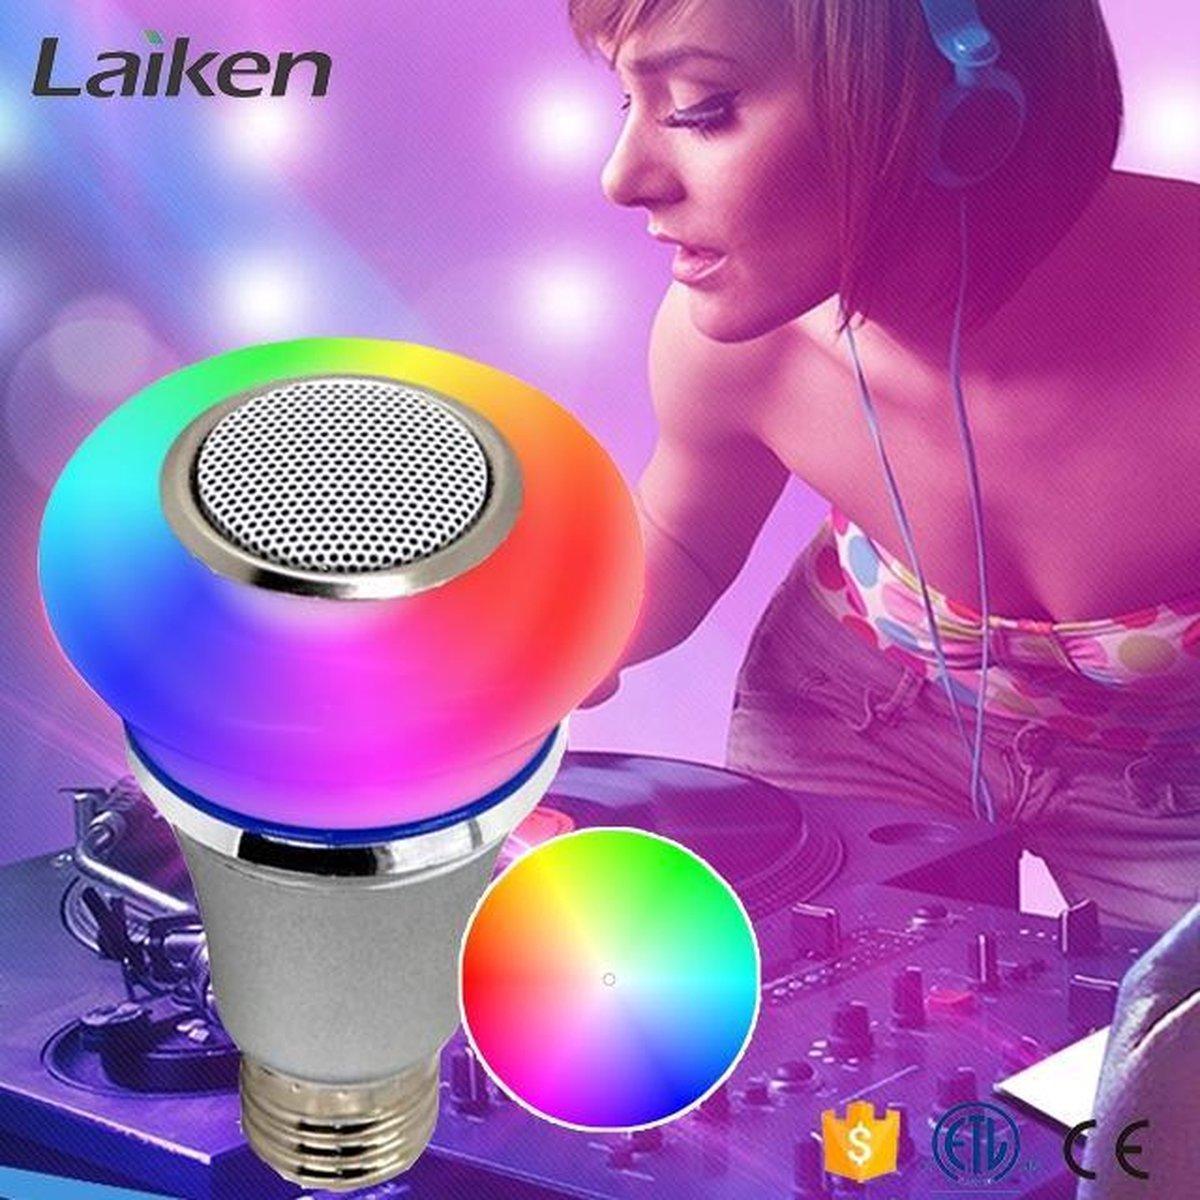 SMART-CONTROLLED MUSIC LED-LAMP - 5W RGB+ - 3W BLUETOOTH SPEAKER - Voordeelset 3 stuks